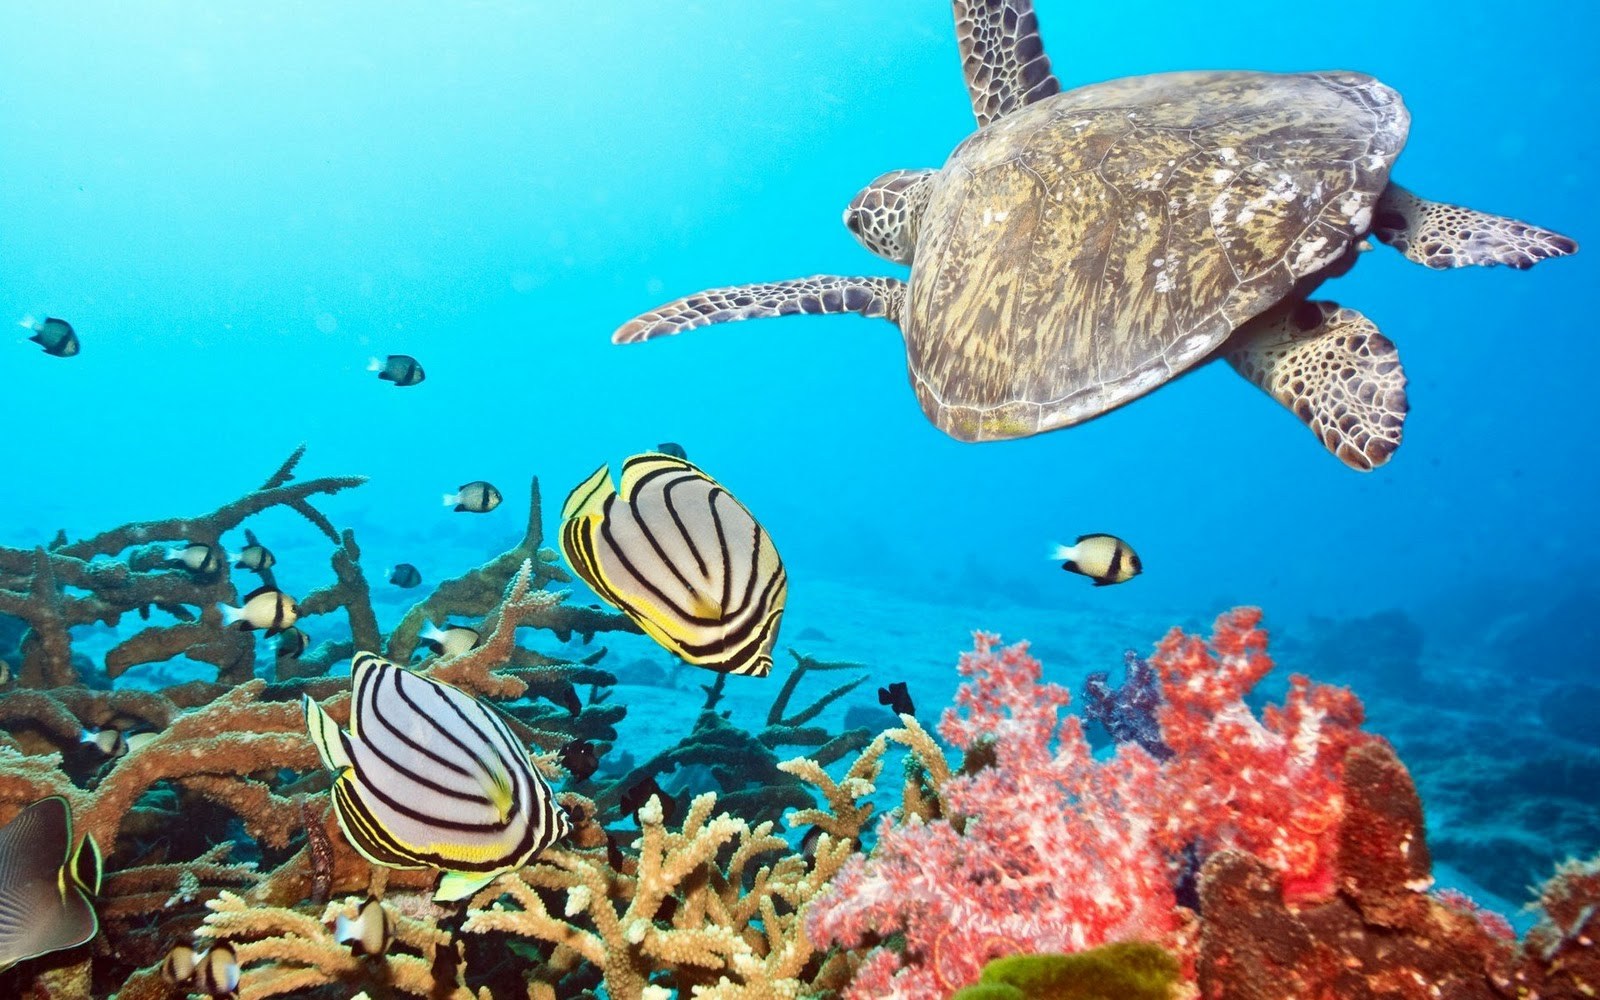 ocean plants ocean fish underwater wallpaper ocean screensaver 1600x1000